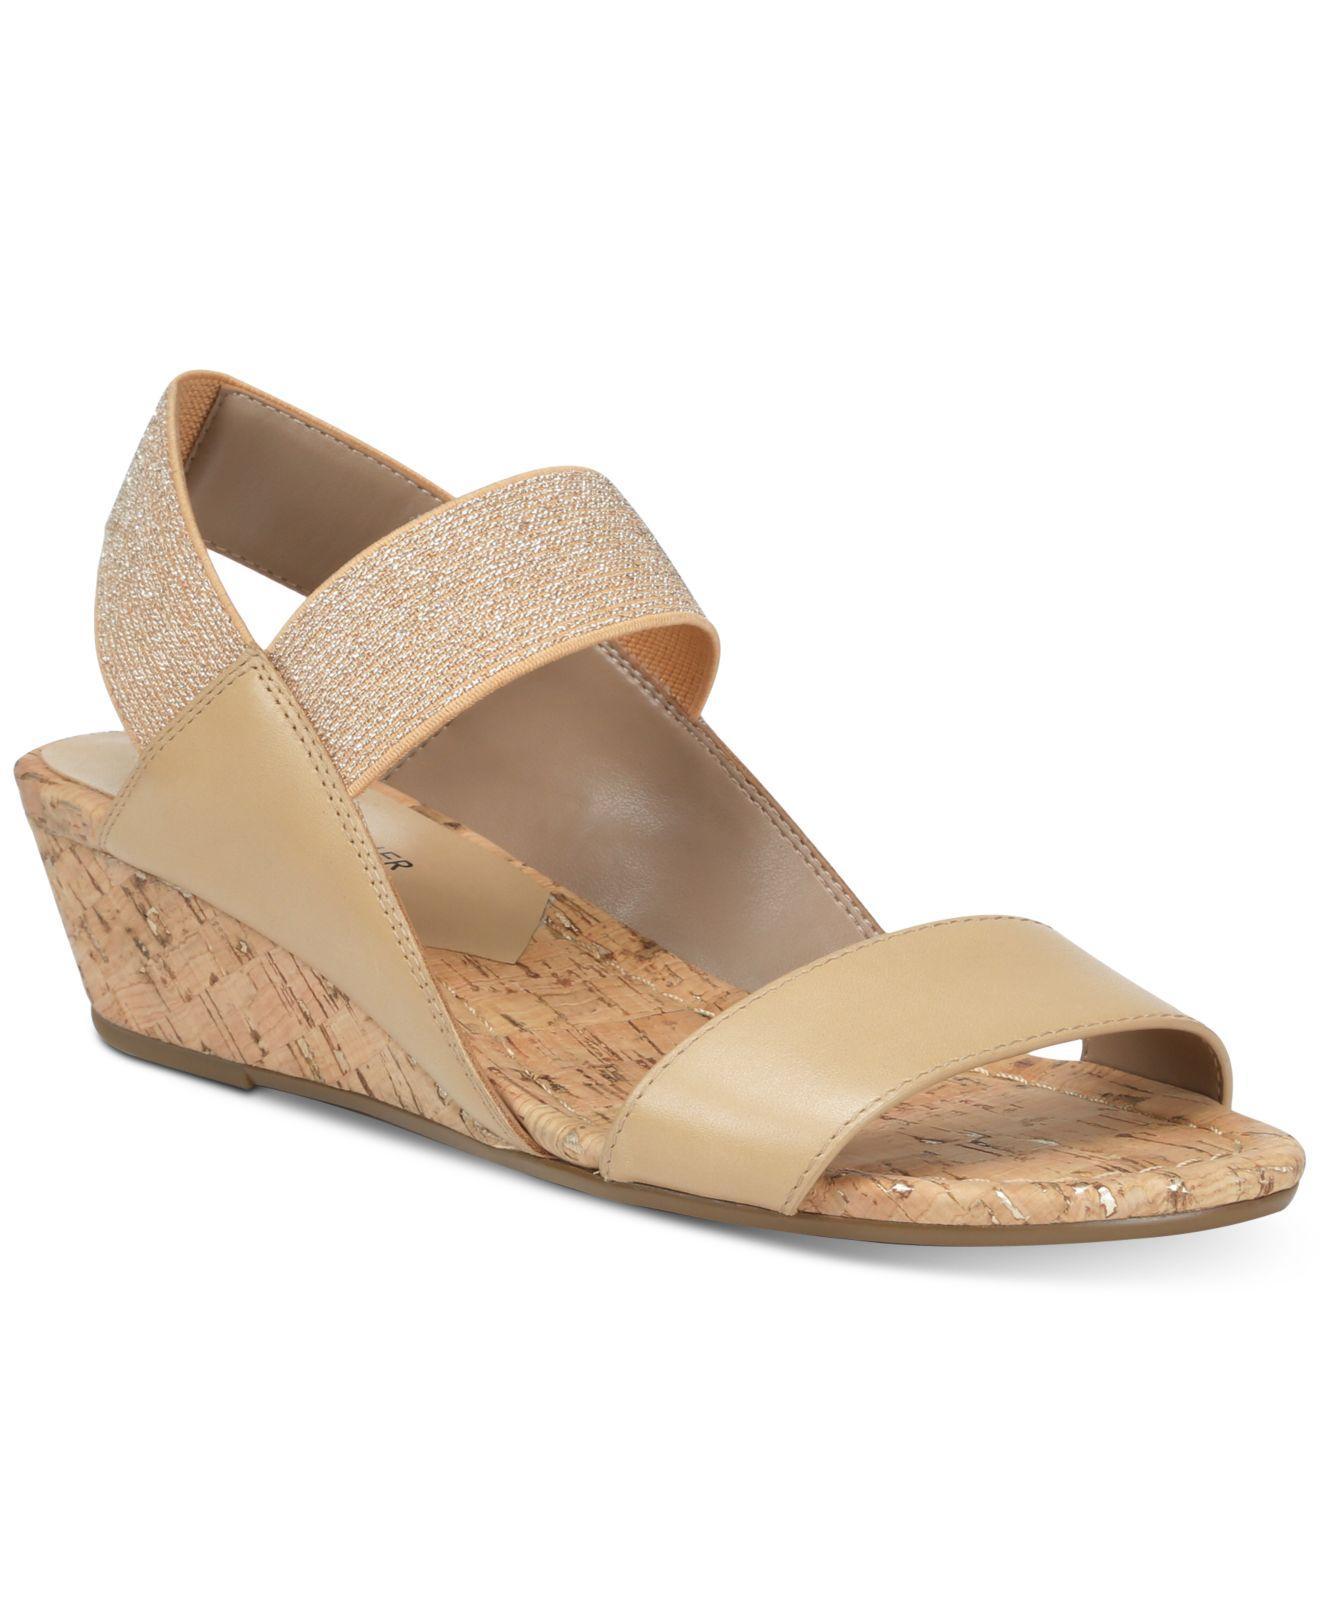 7e643a09d9a0 Lyst - Donald J Pliner Elsie Wedge Sandals in Natural